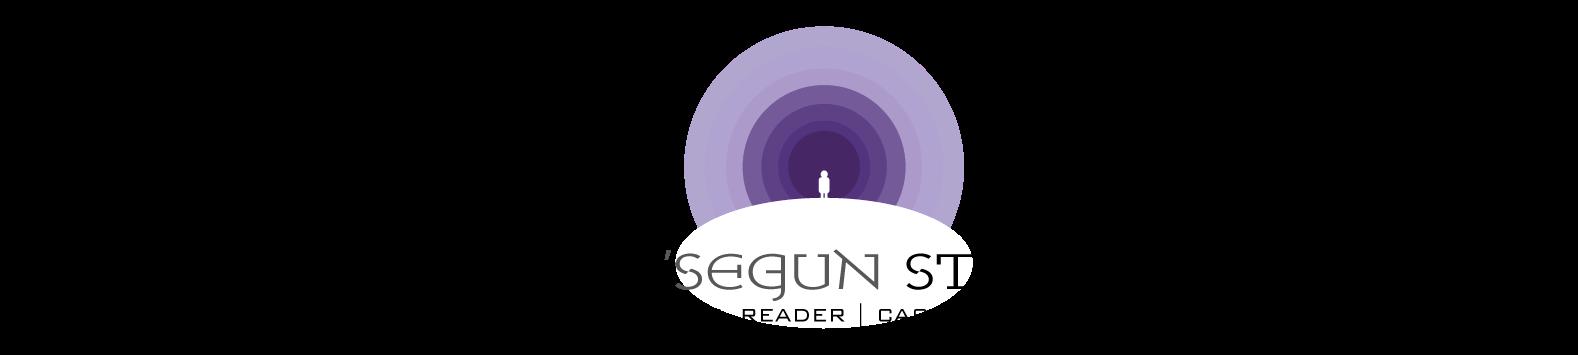 'Yomi 'Segun Stephen - Professional Reader | Casual Observer